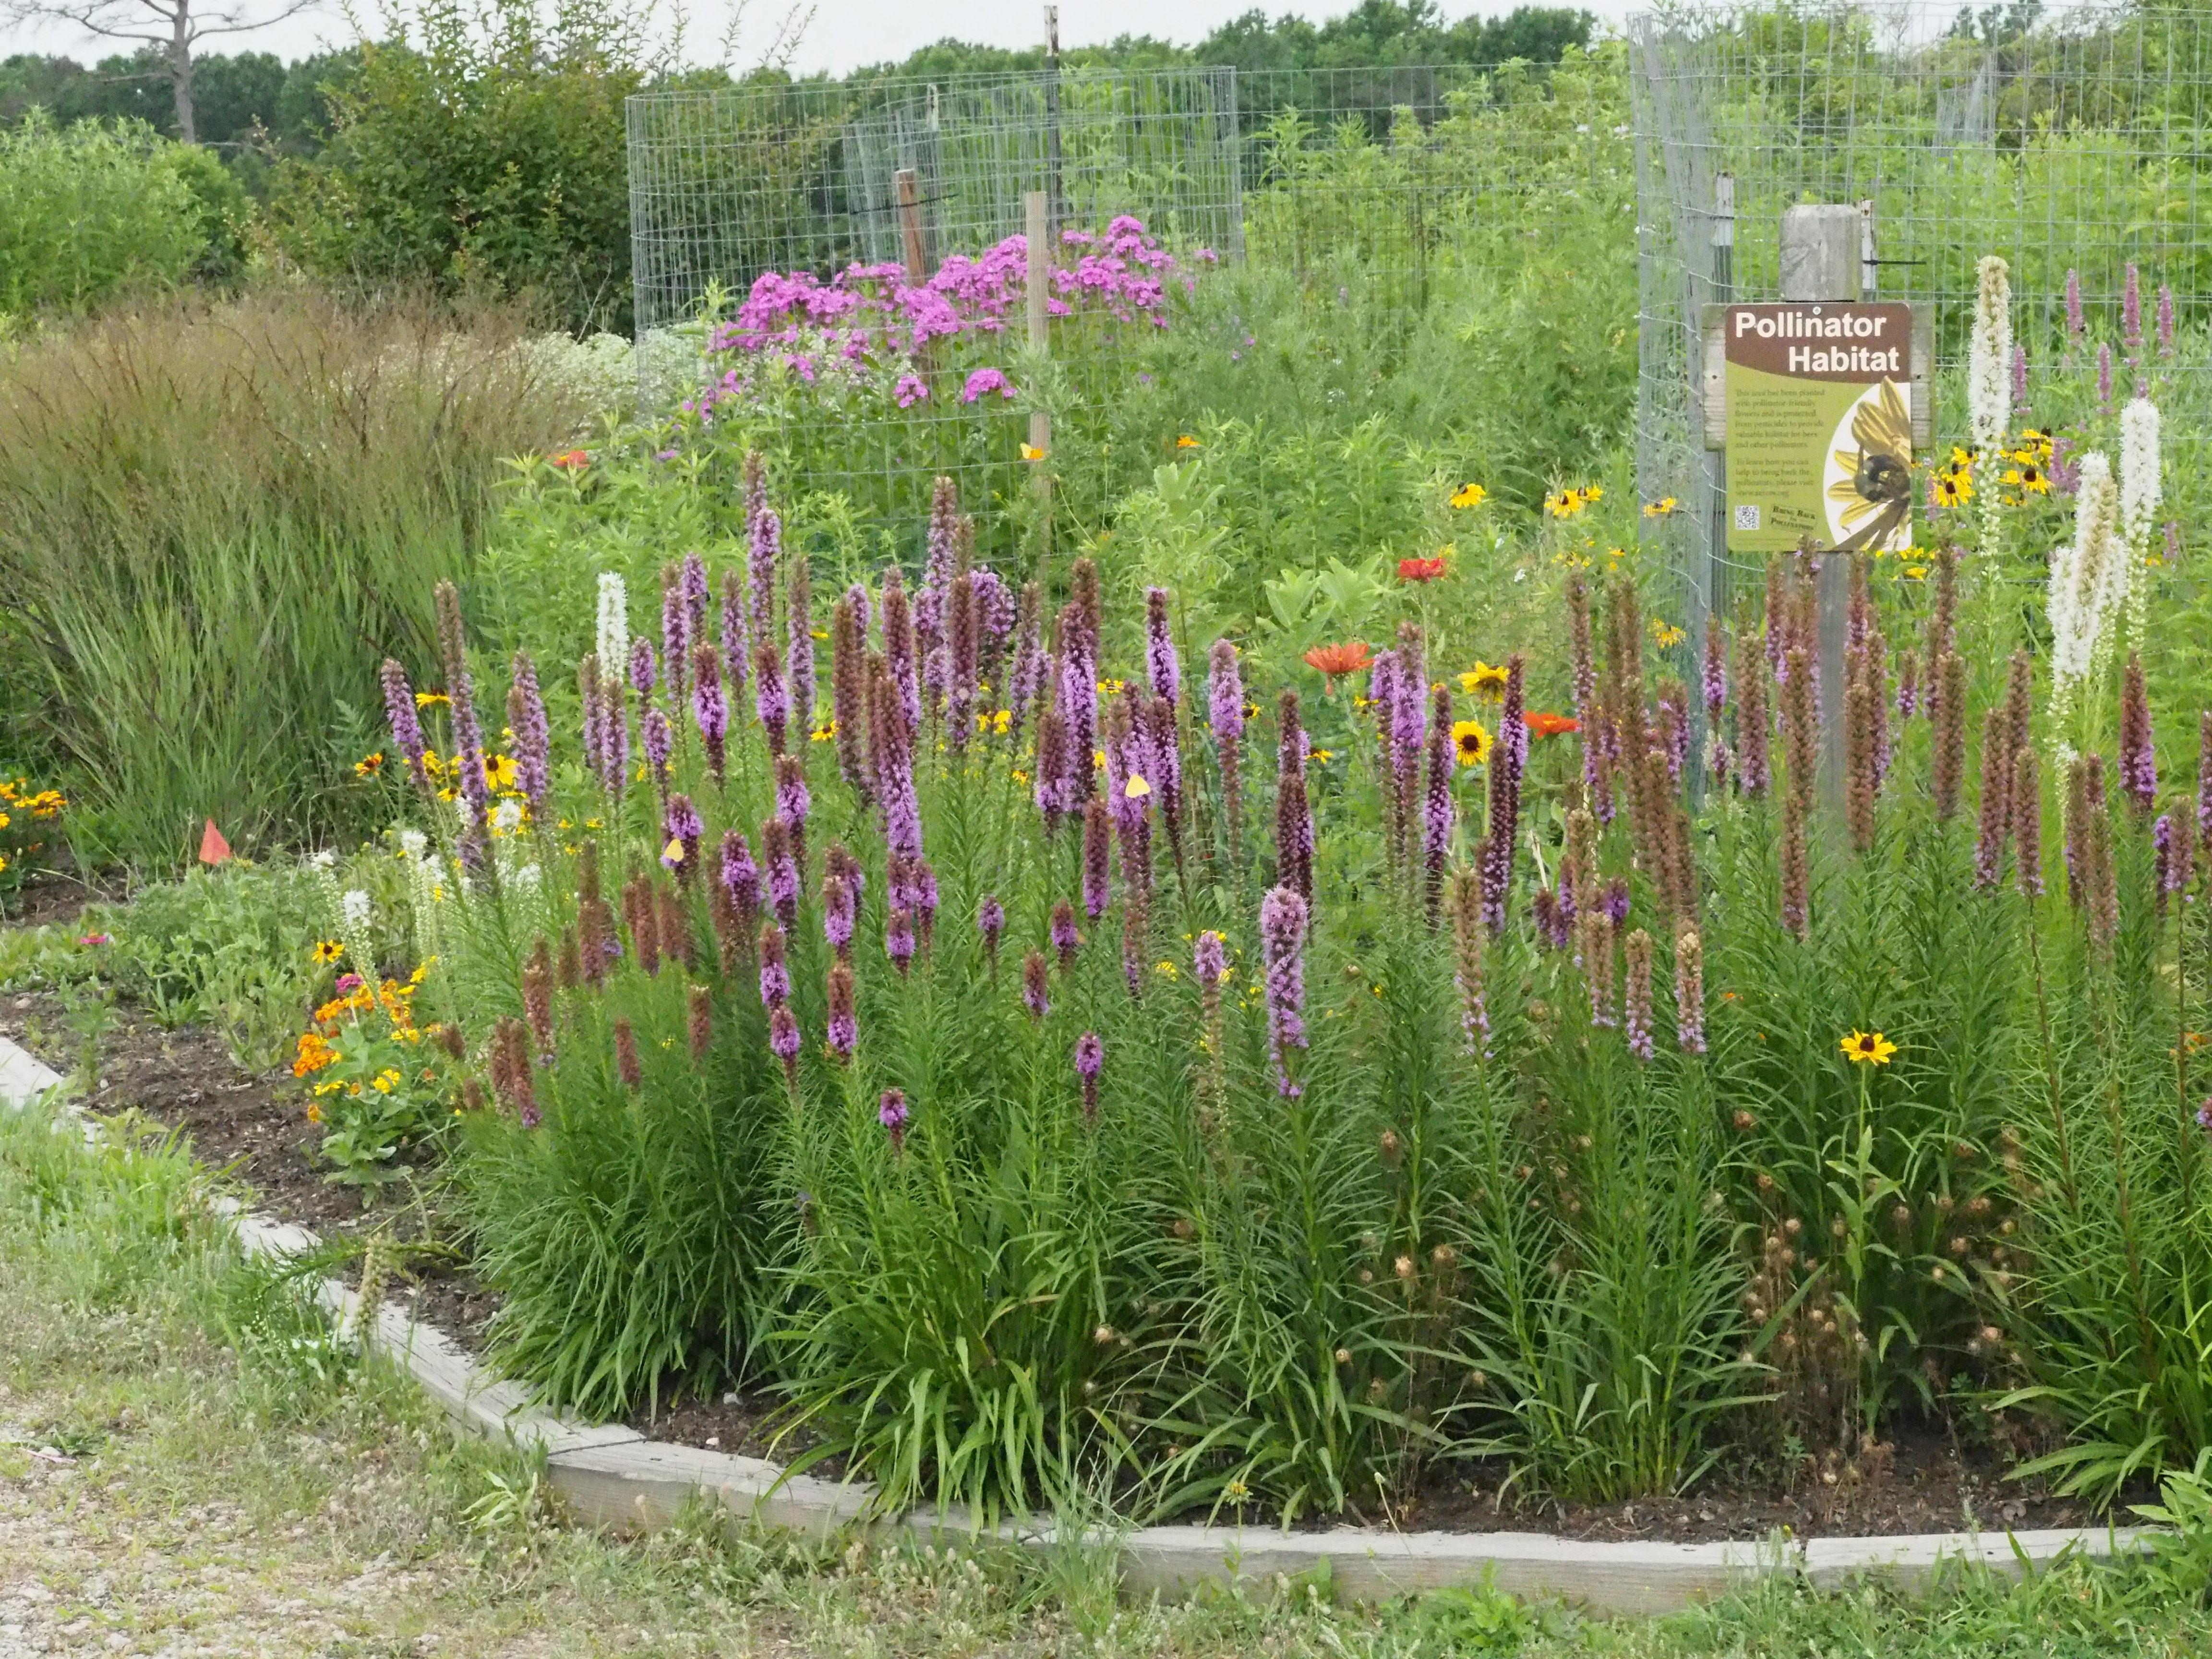 Pollinator habitat garden on Mason Neck